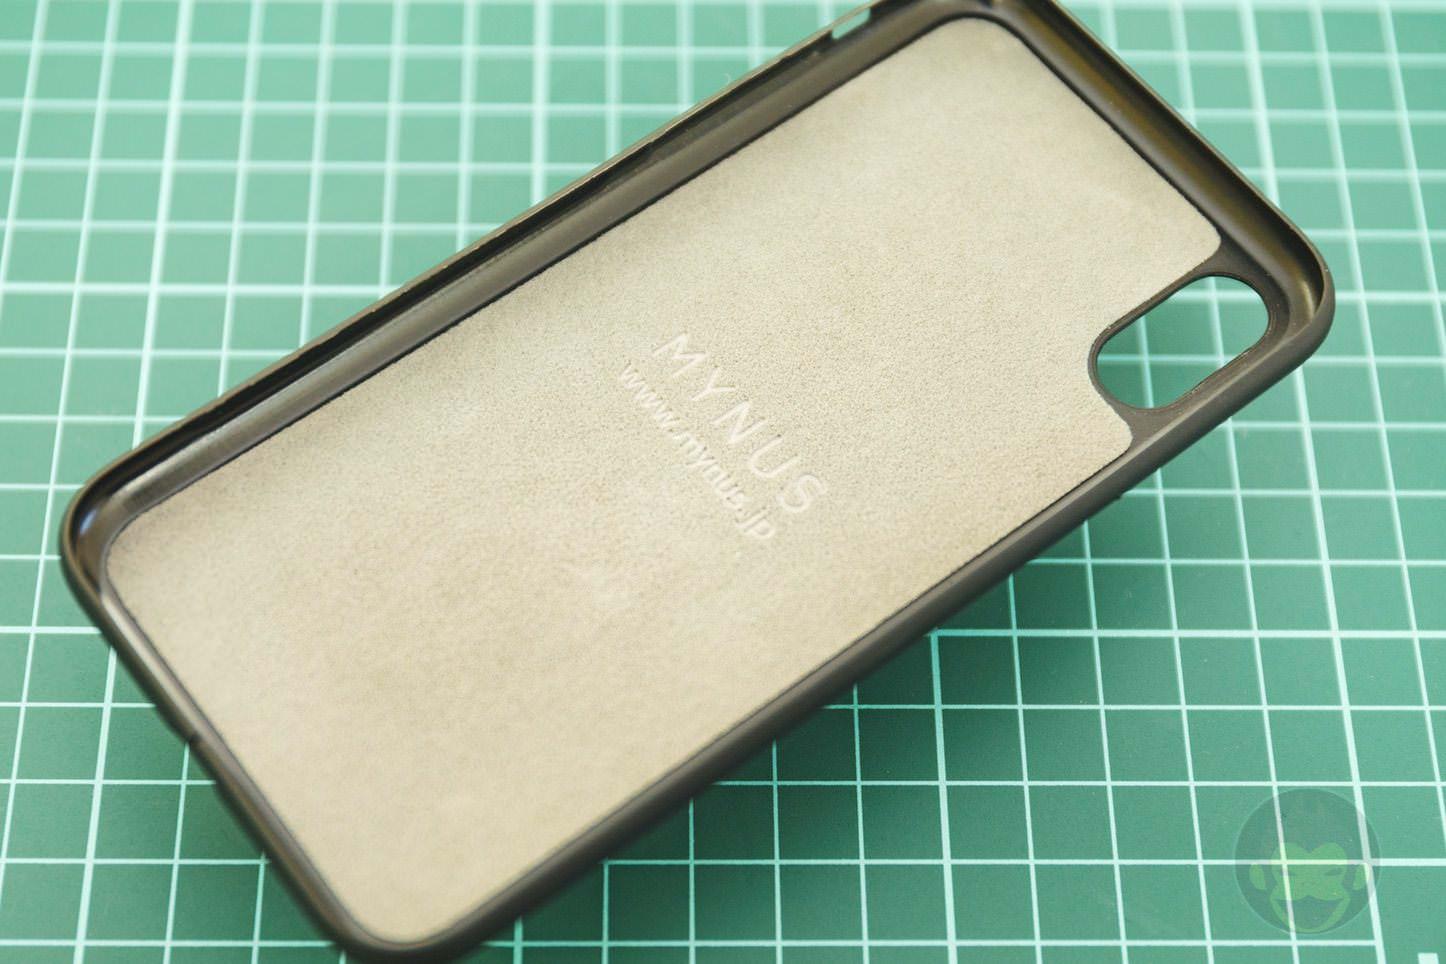 Mynus-iPhoneX-Case-Black-White-19.jpg